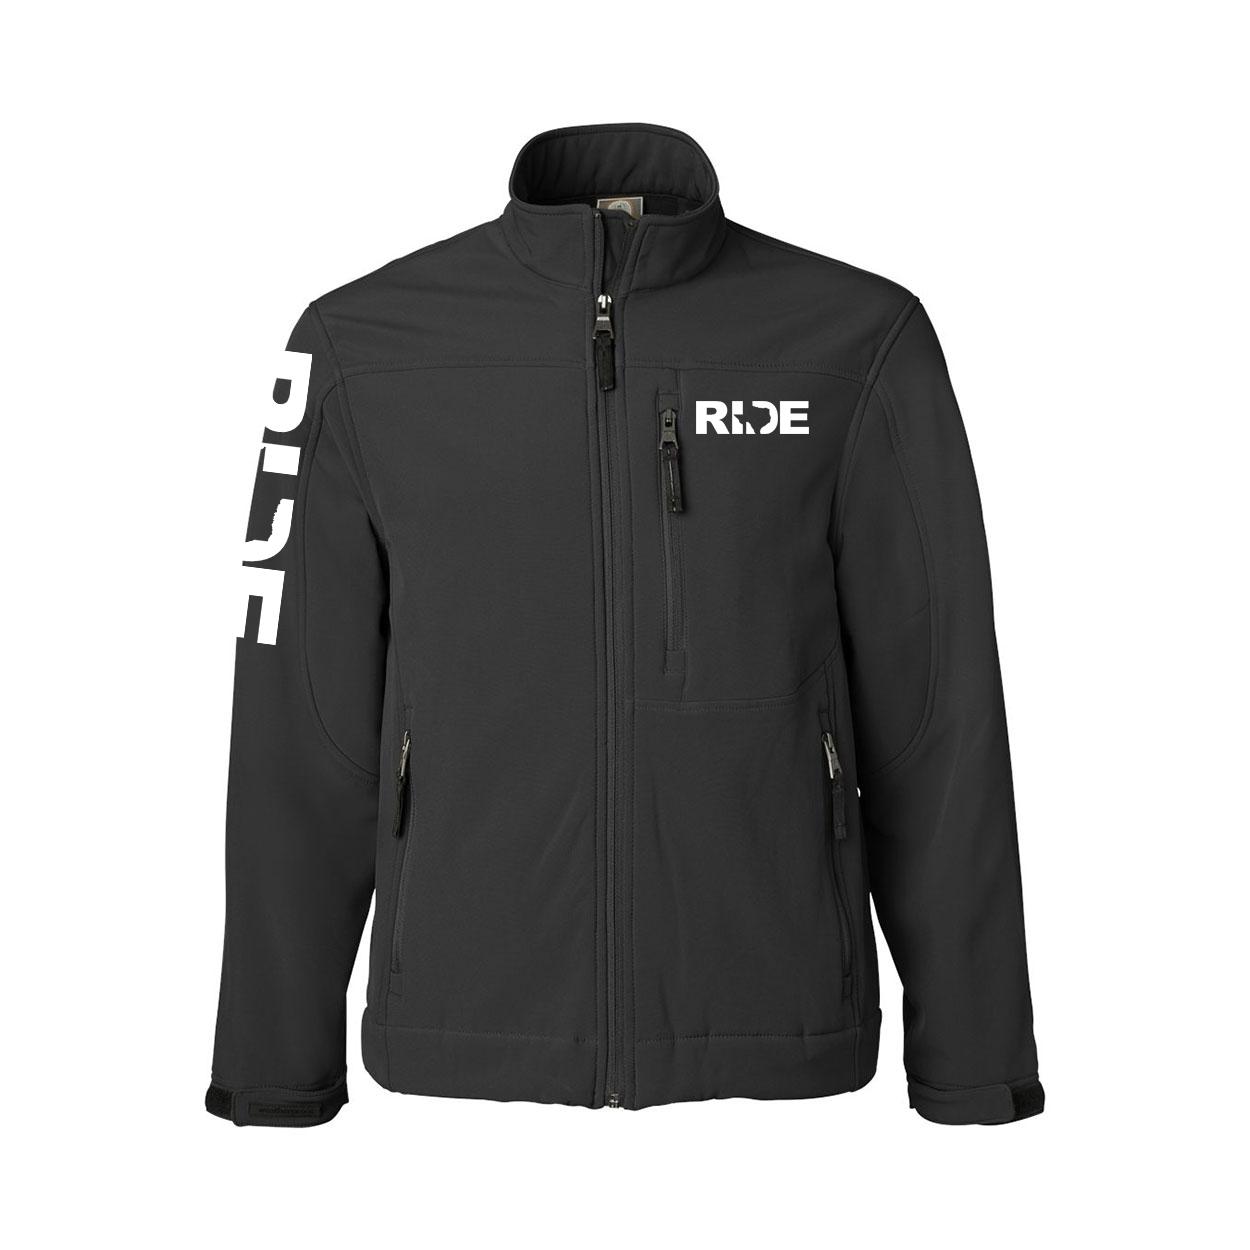 Ride Texas Classic Soft Shell Weatherproof Jacket